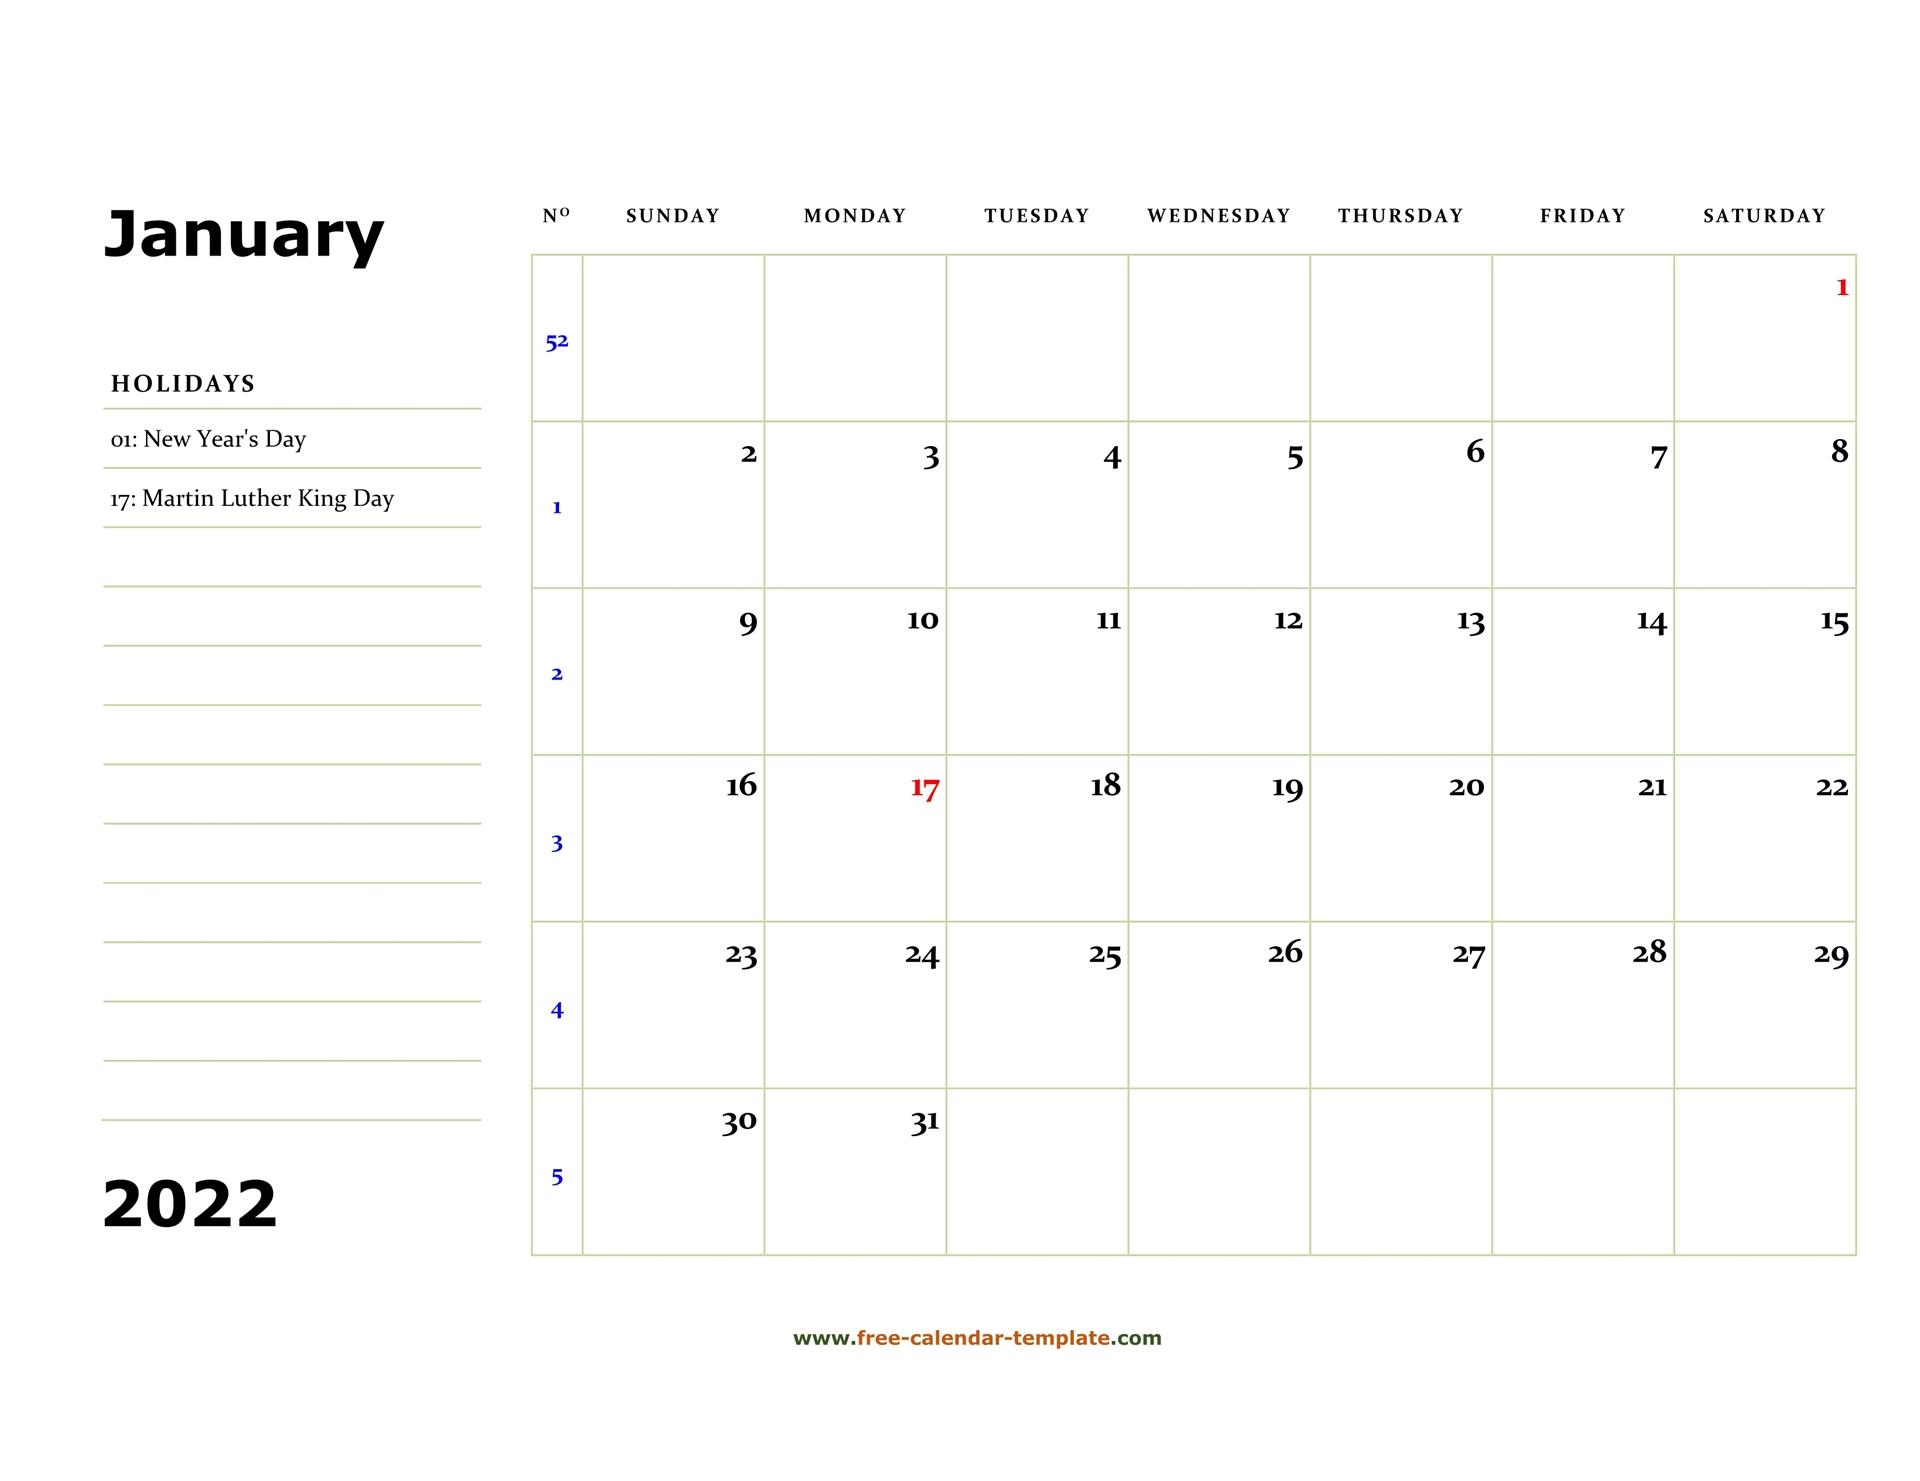 January 2022 Free Calendar Tempplate | Free Calendar Template With Regard To Landscape Calendar January 2022